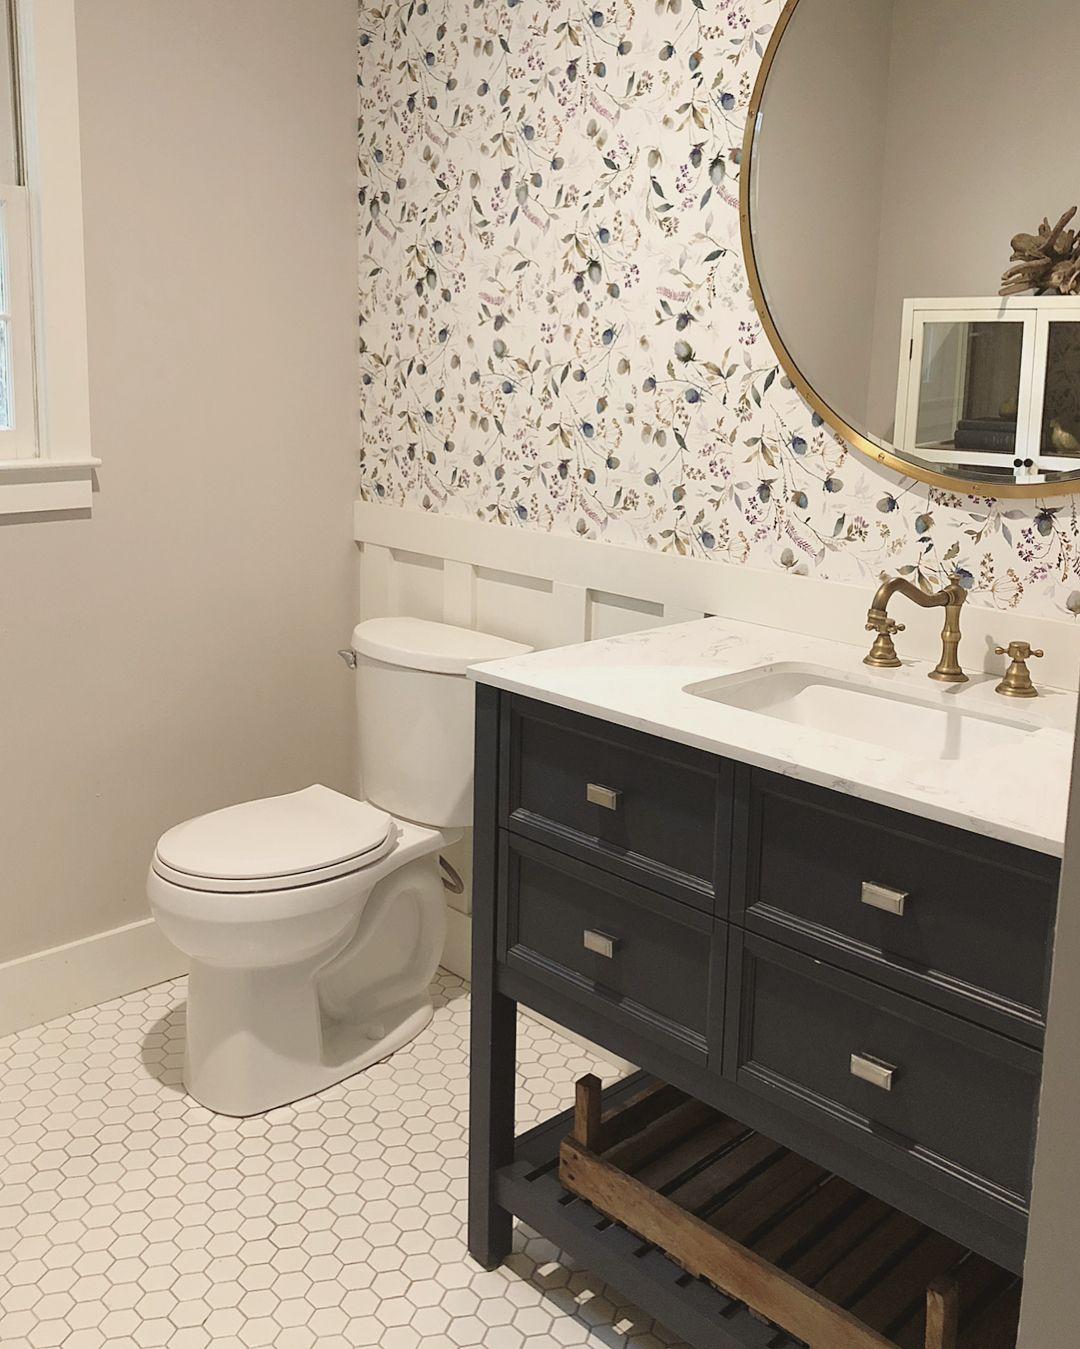 Pin On Lr Half Bath Half bedroom wall tiles